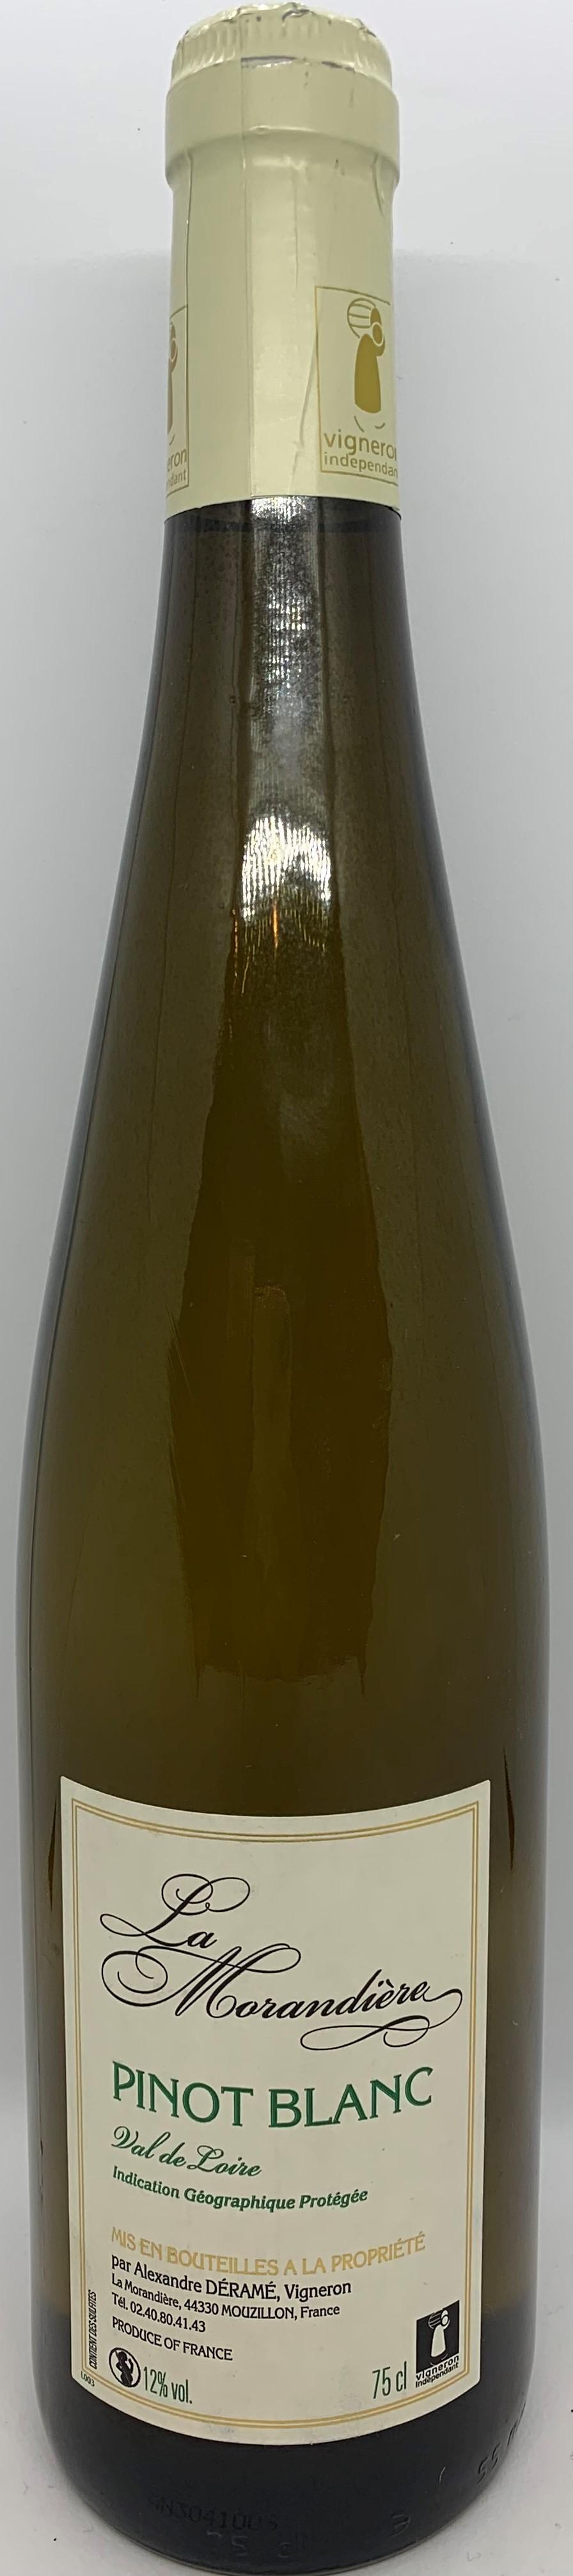 Domaine de la Morandiere Pinot Blanc